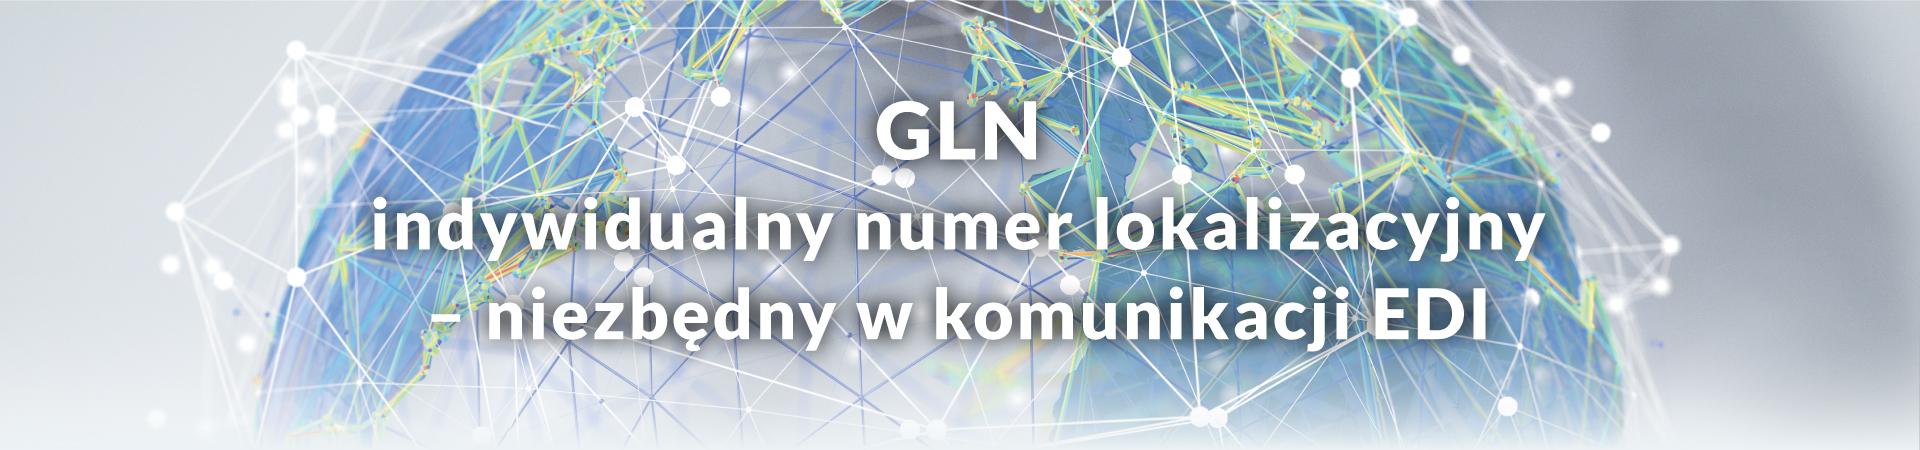 baner_GLN_Edison_popr7